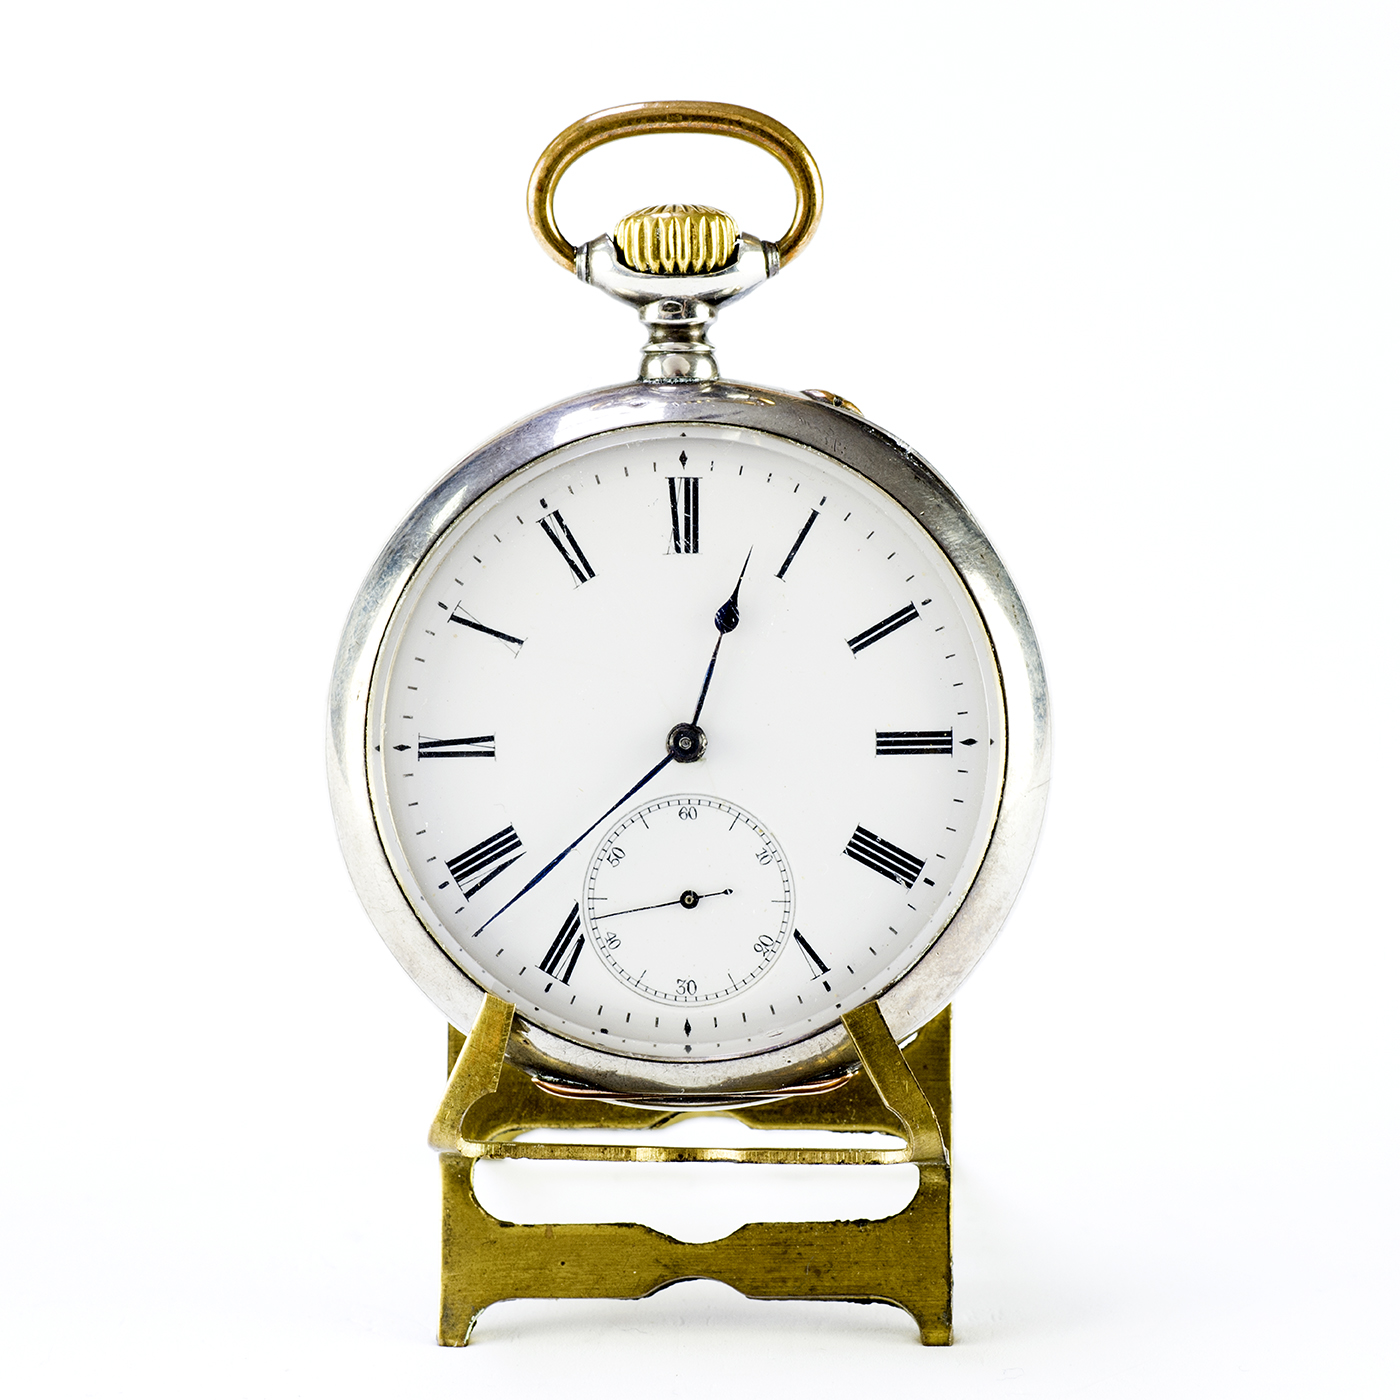 International Watch Company JVC). Reloj de Bolsillo lepine y remontoir. Ca. 1900.